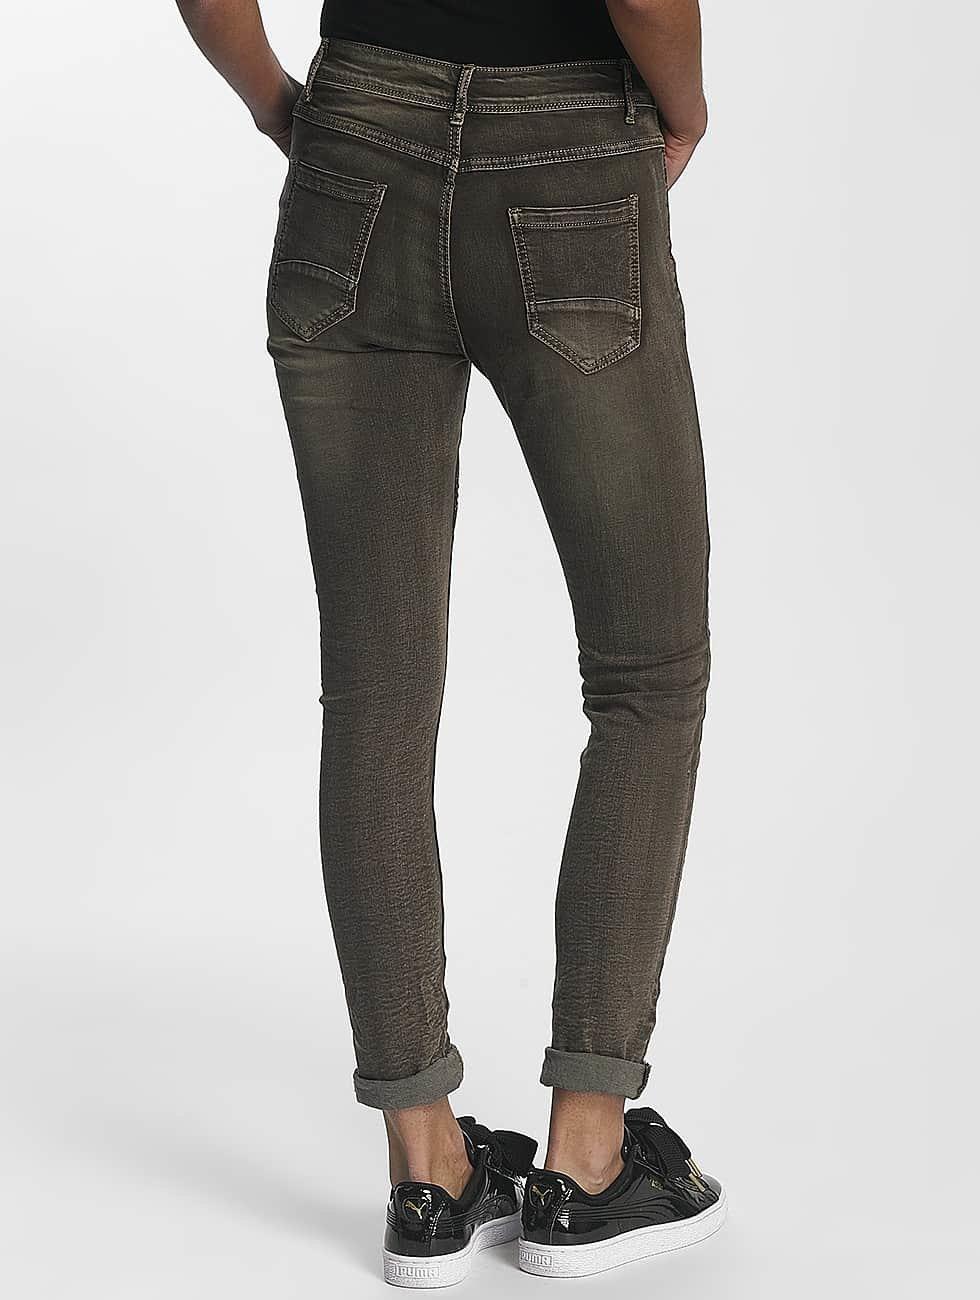 Leg Kings Облегающие джинсы Zac&Zoe хаки